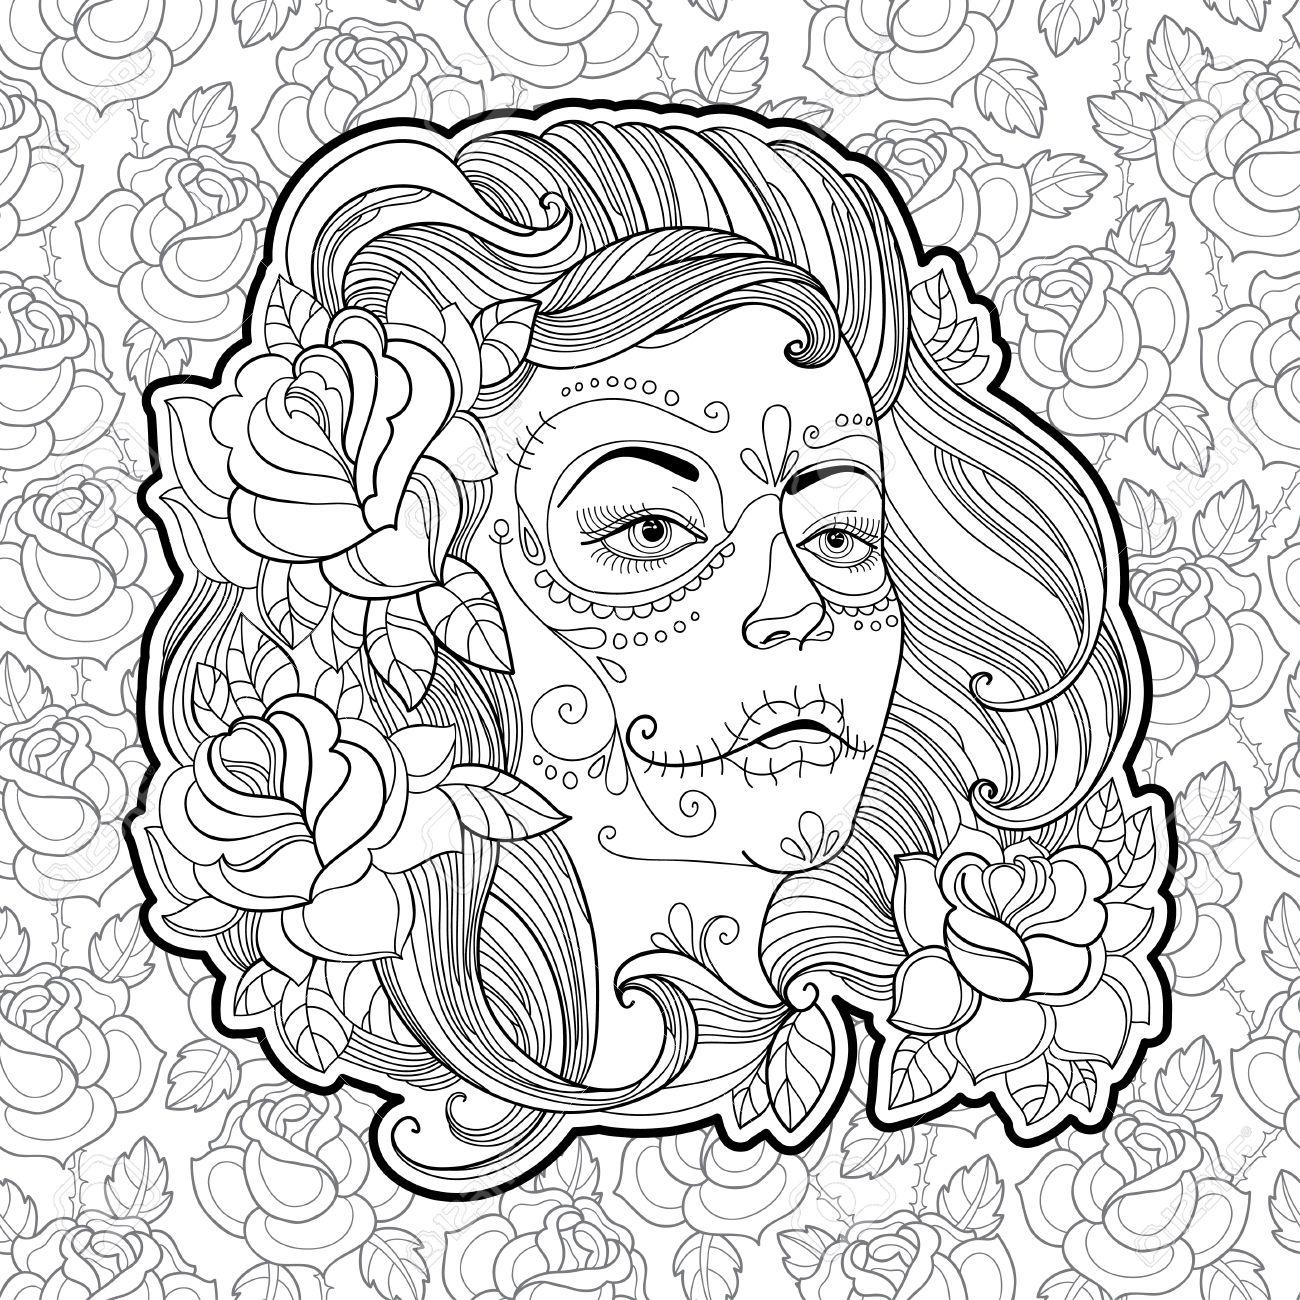 1300x1300 Woman Face With Sugar Skull Or Calavera Catrina Makeup On